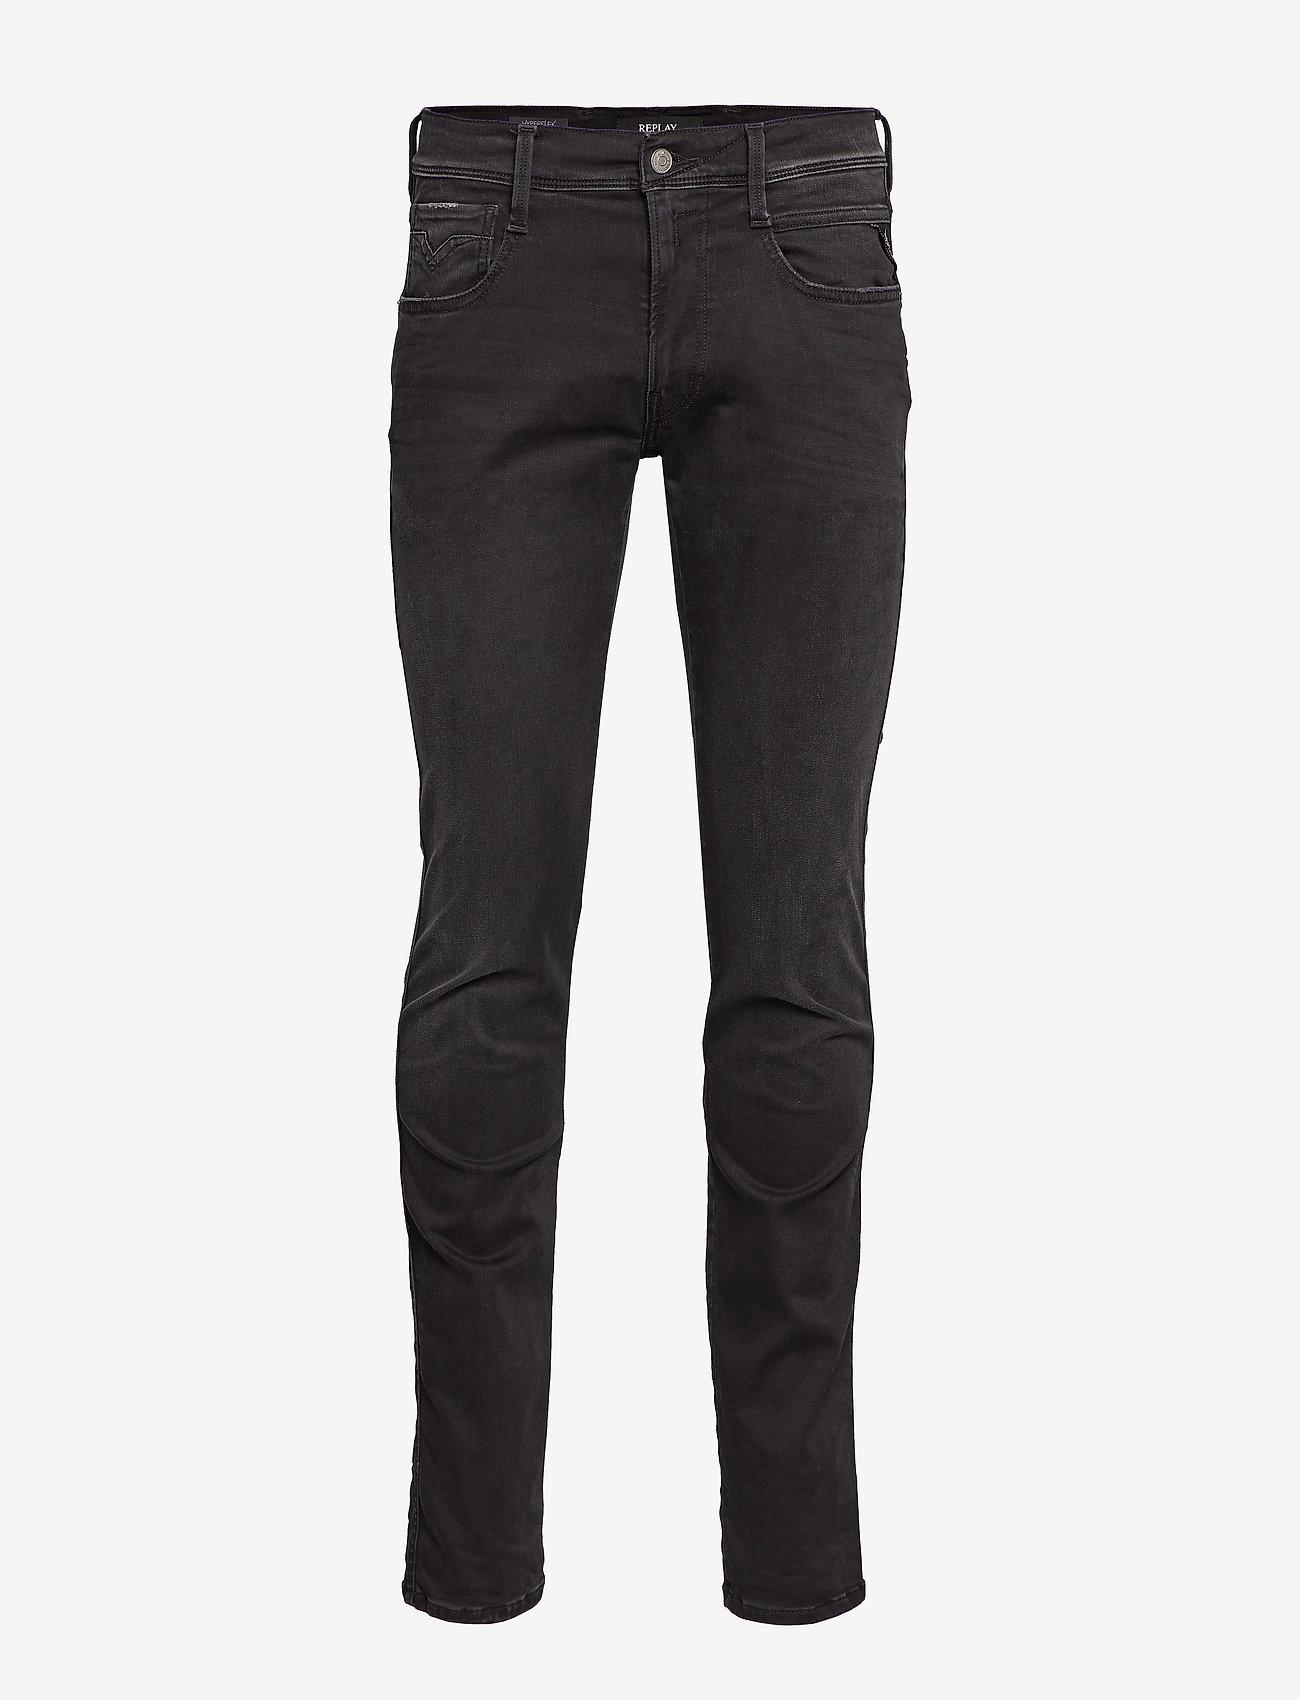 Replay ANBASS - Jeans BLACK gwEPPZJ3